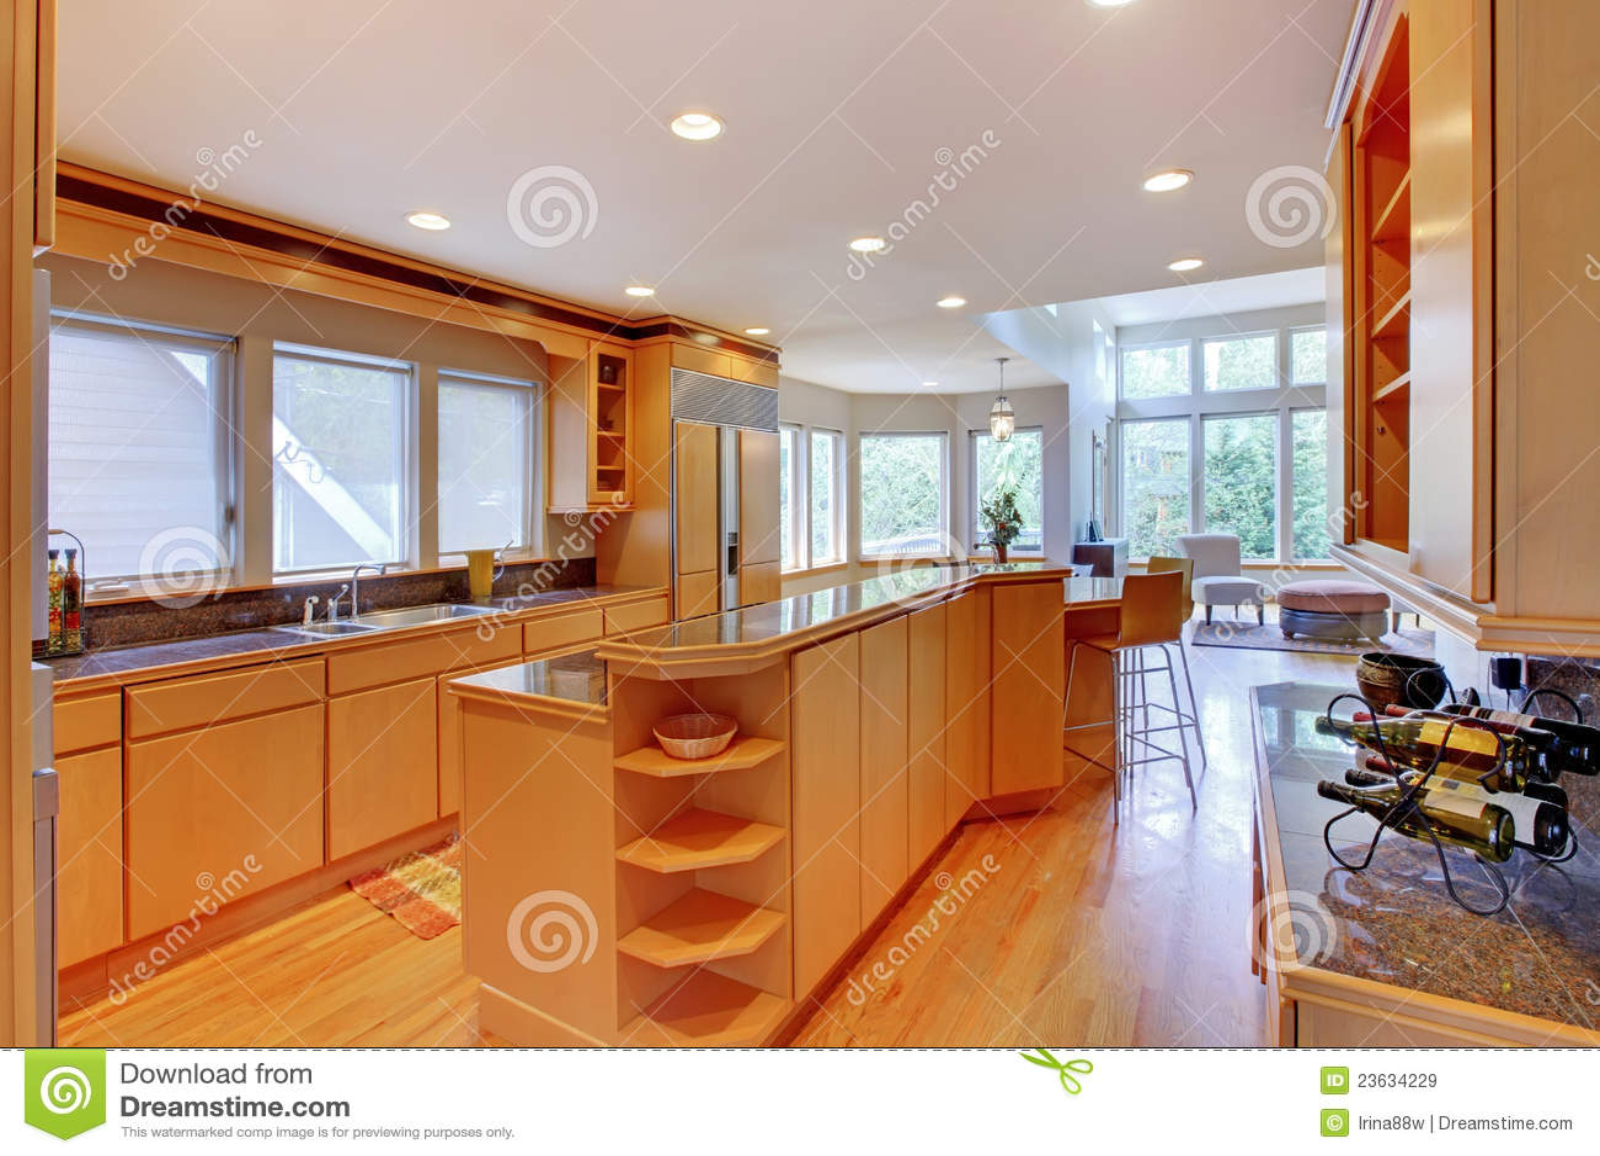 Cocina de madera moderna de lujo grande imagen de archivo imagen de cocina muebles 23634229 Cocinas grandes modernas